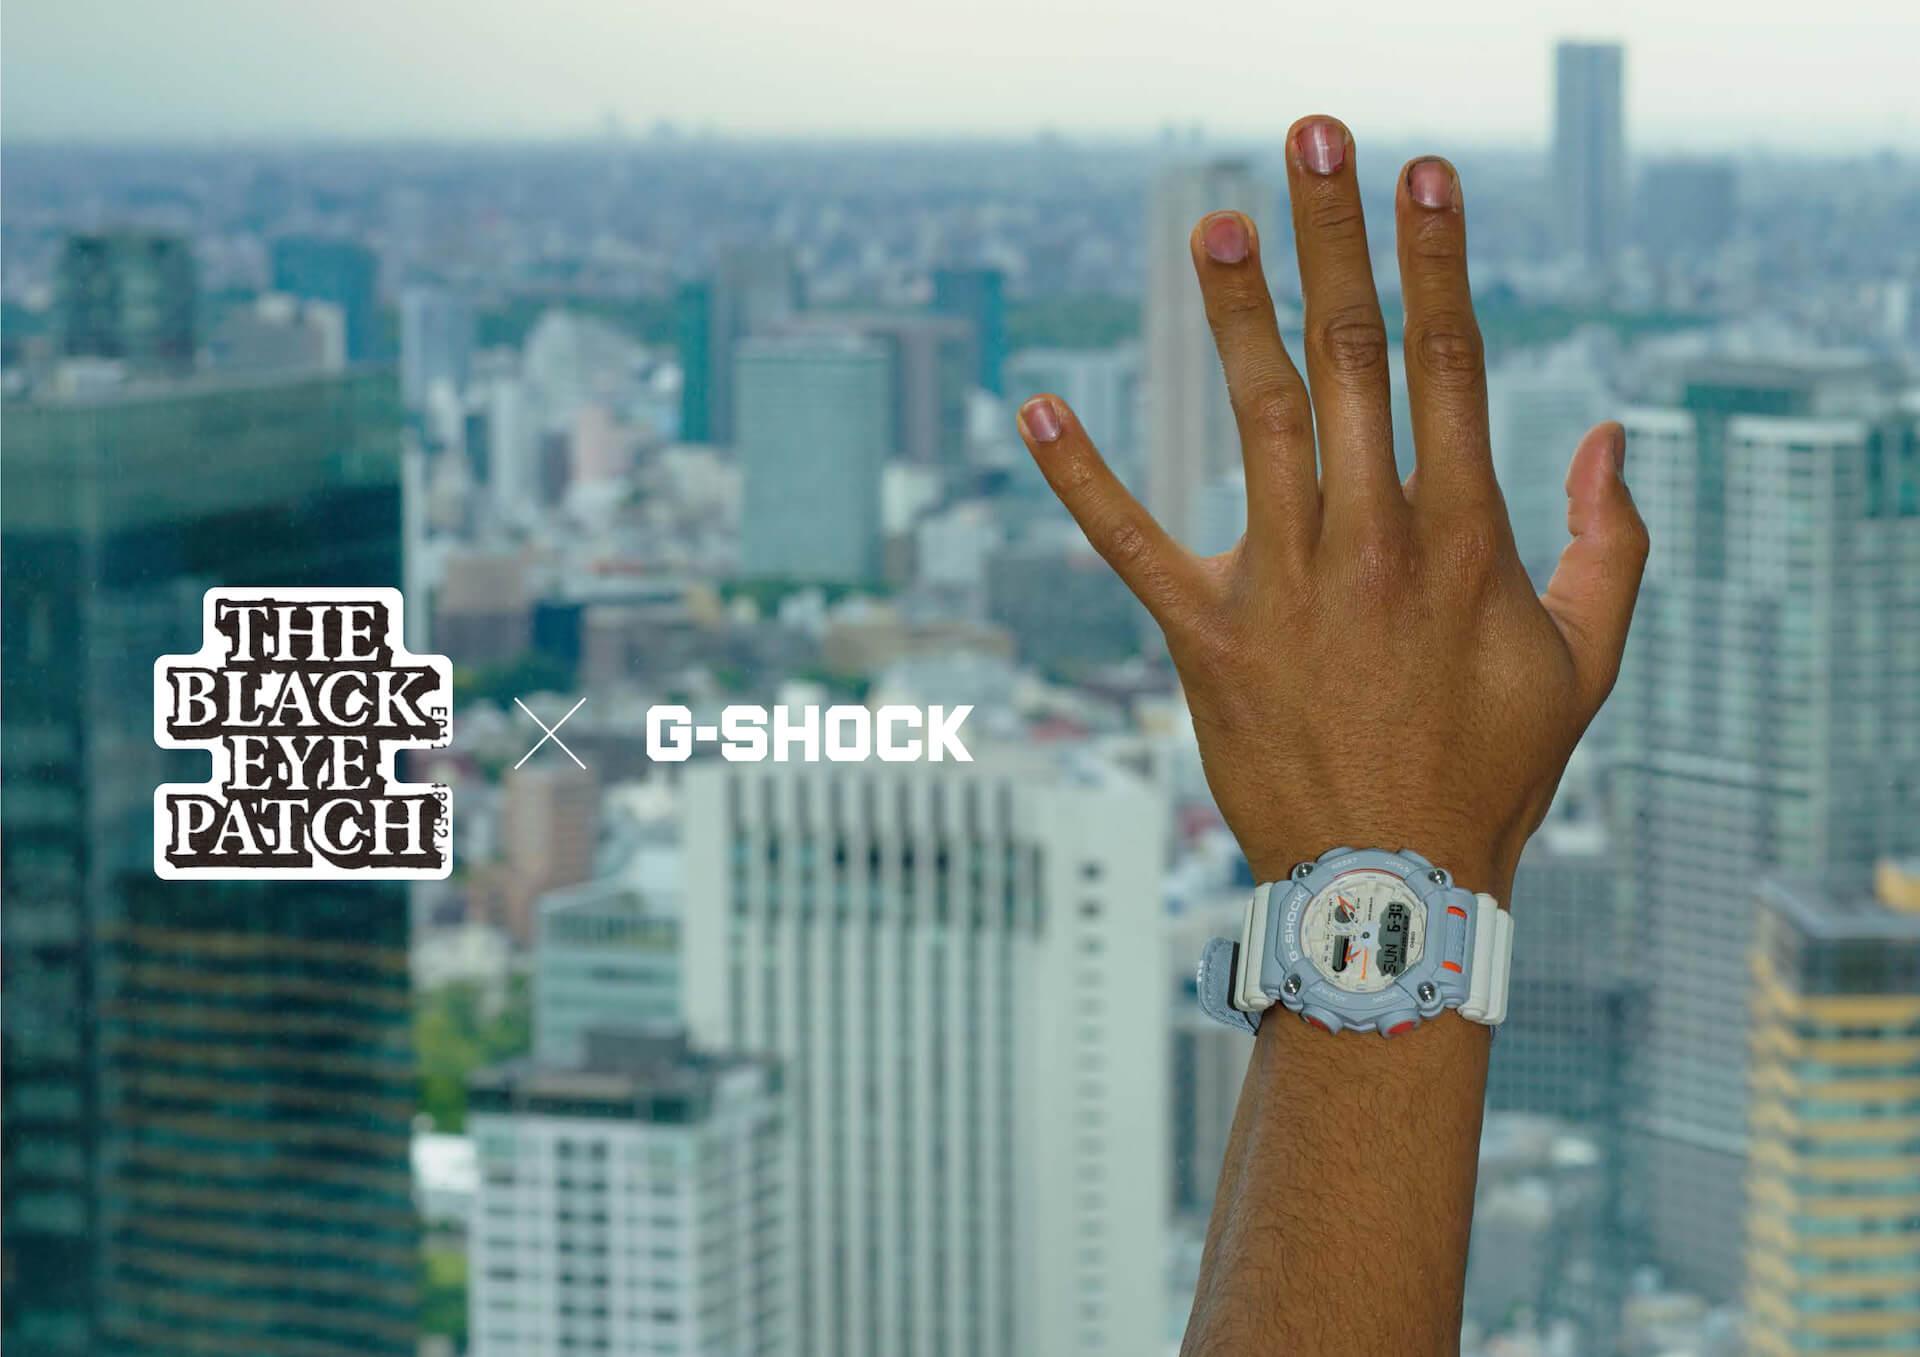 G-SHOCKとBlackEyePatchの新たなコラボモデル「GA-900BEP-8AJR」が発売決定!バンド交換可能なスタイリッシュなモデル tech210830_gshock_blackeyepatch_5